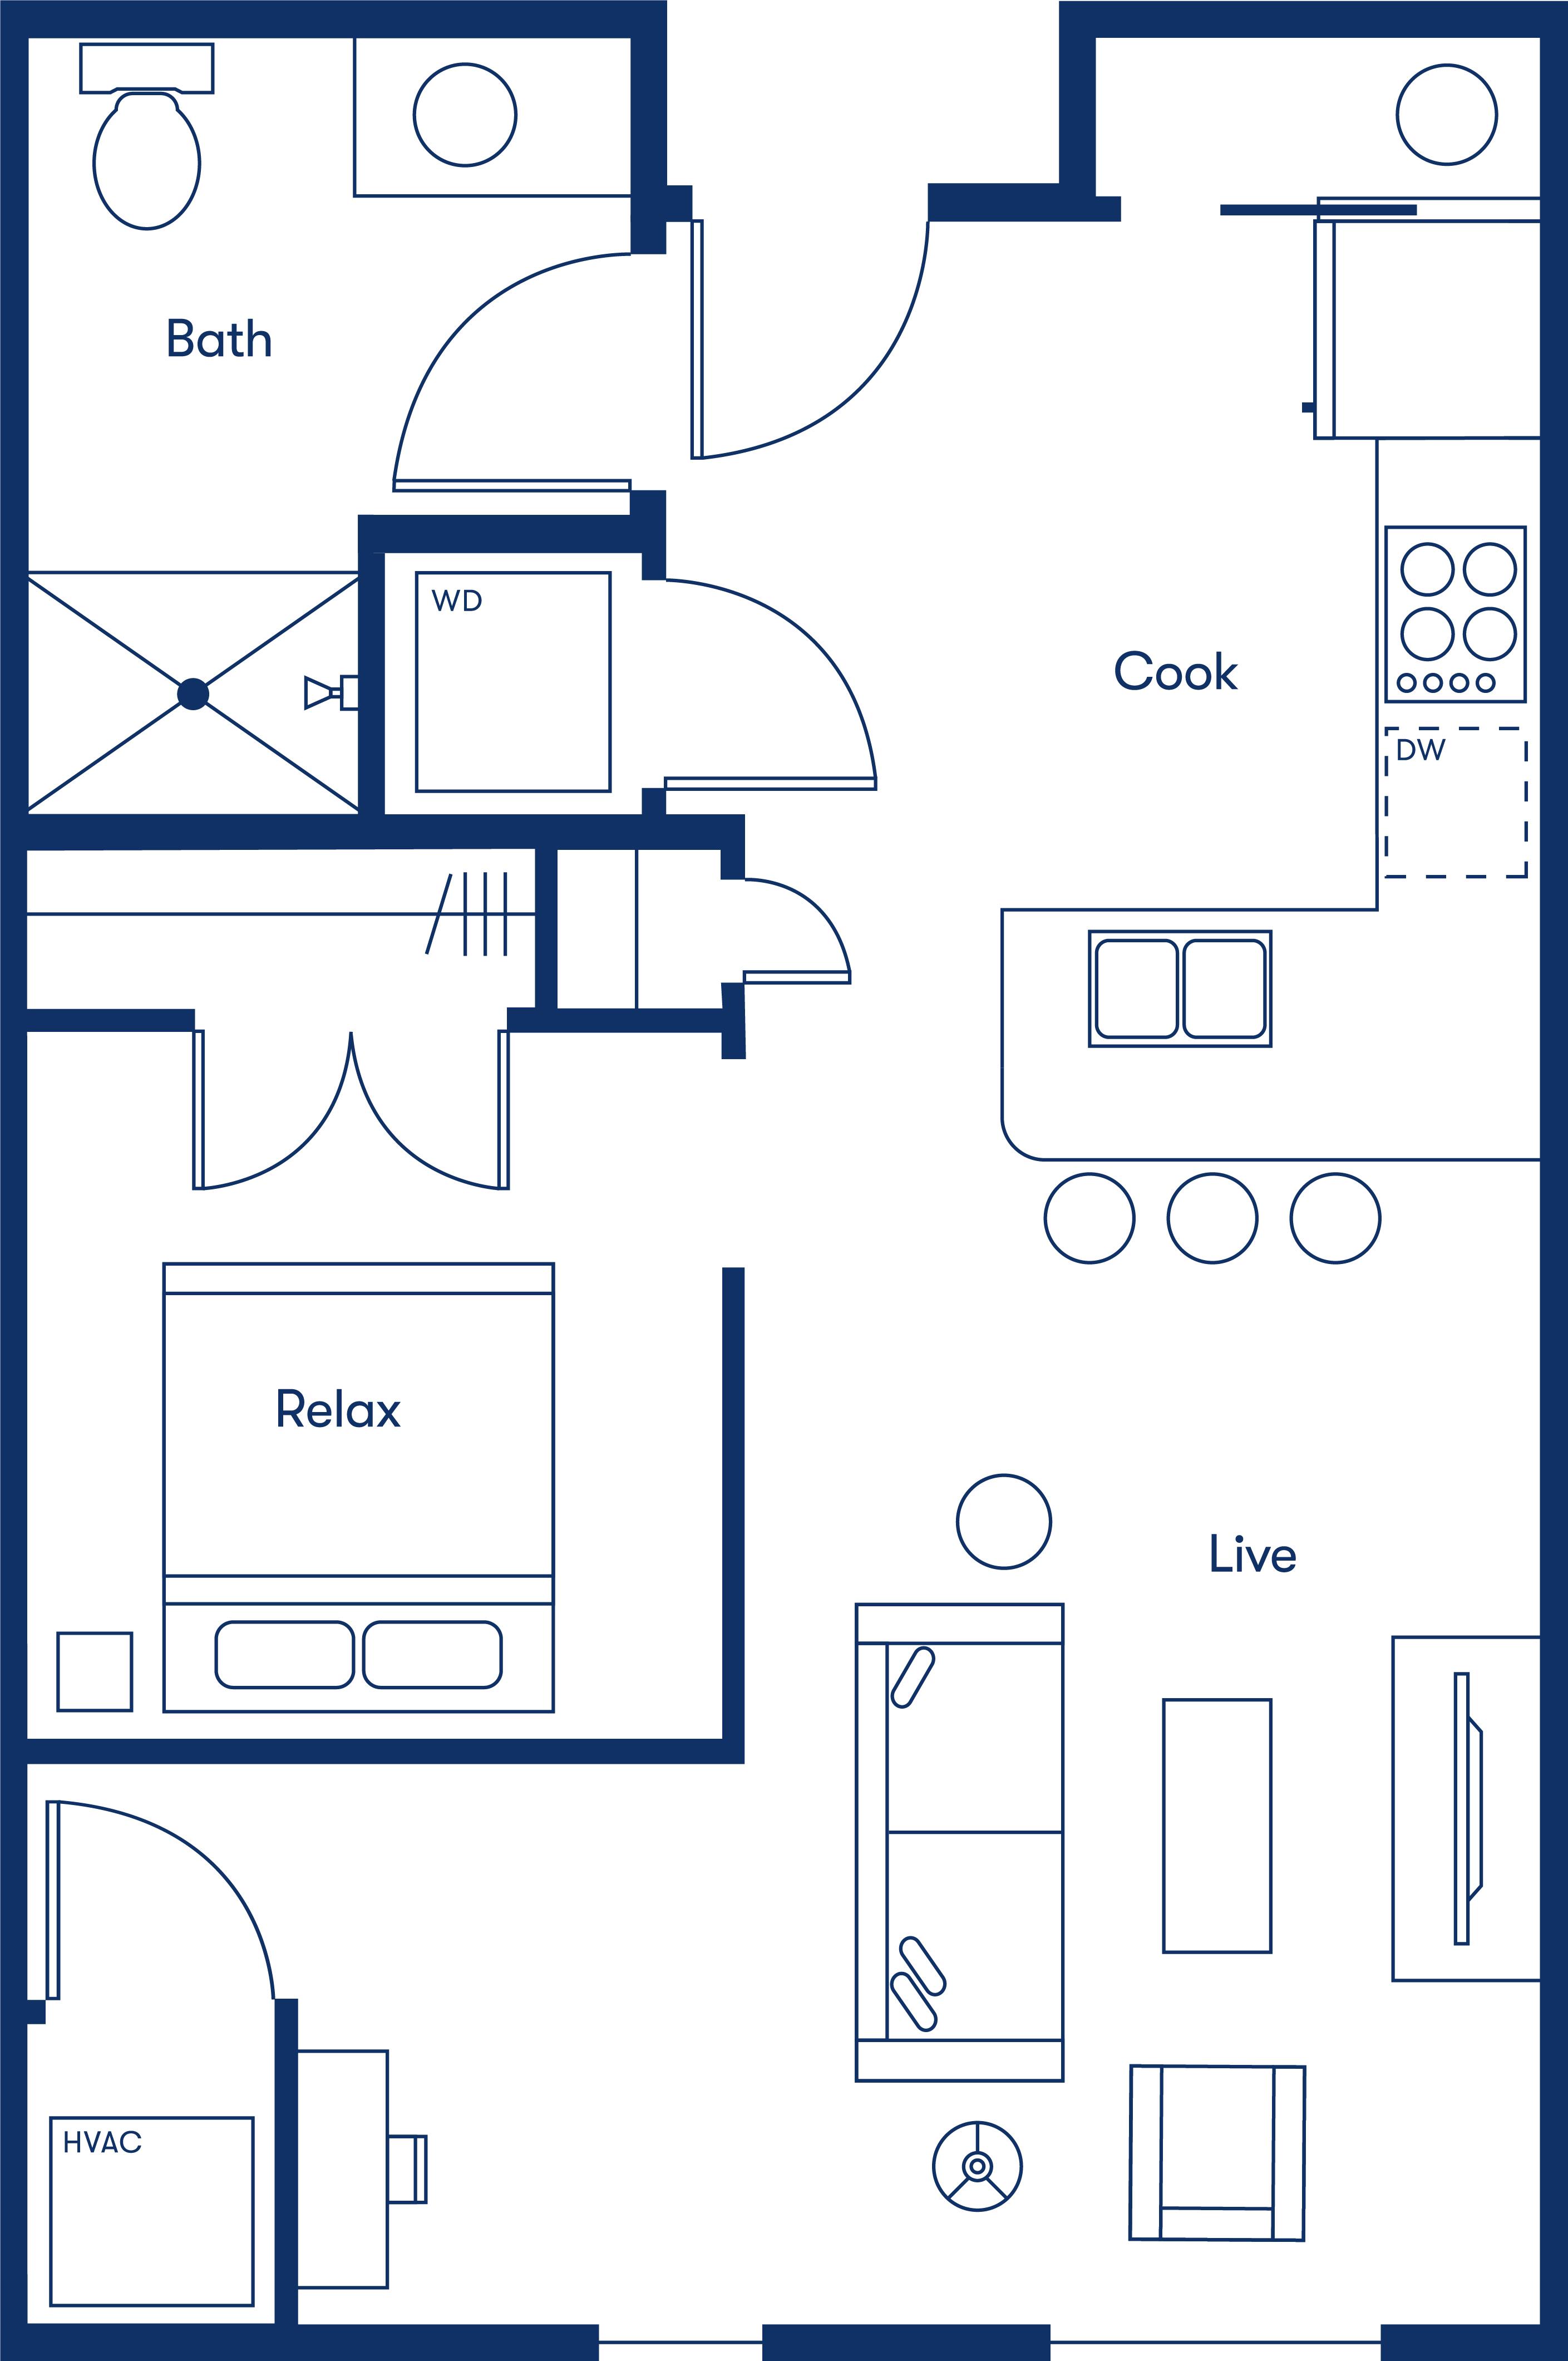 Simple floorplan layout of the Junior 1 Bedroom apartment